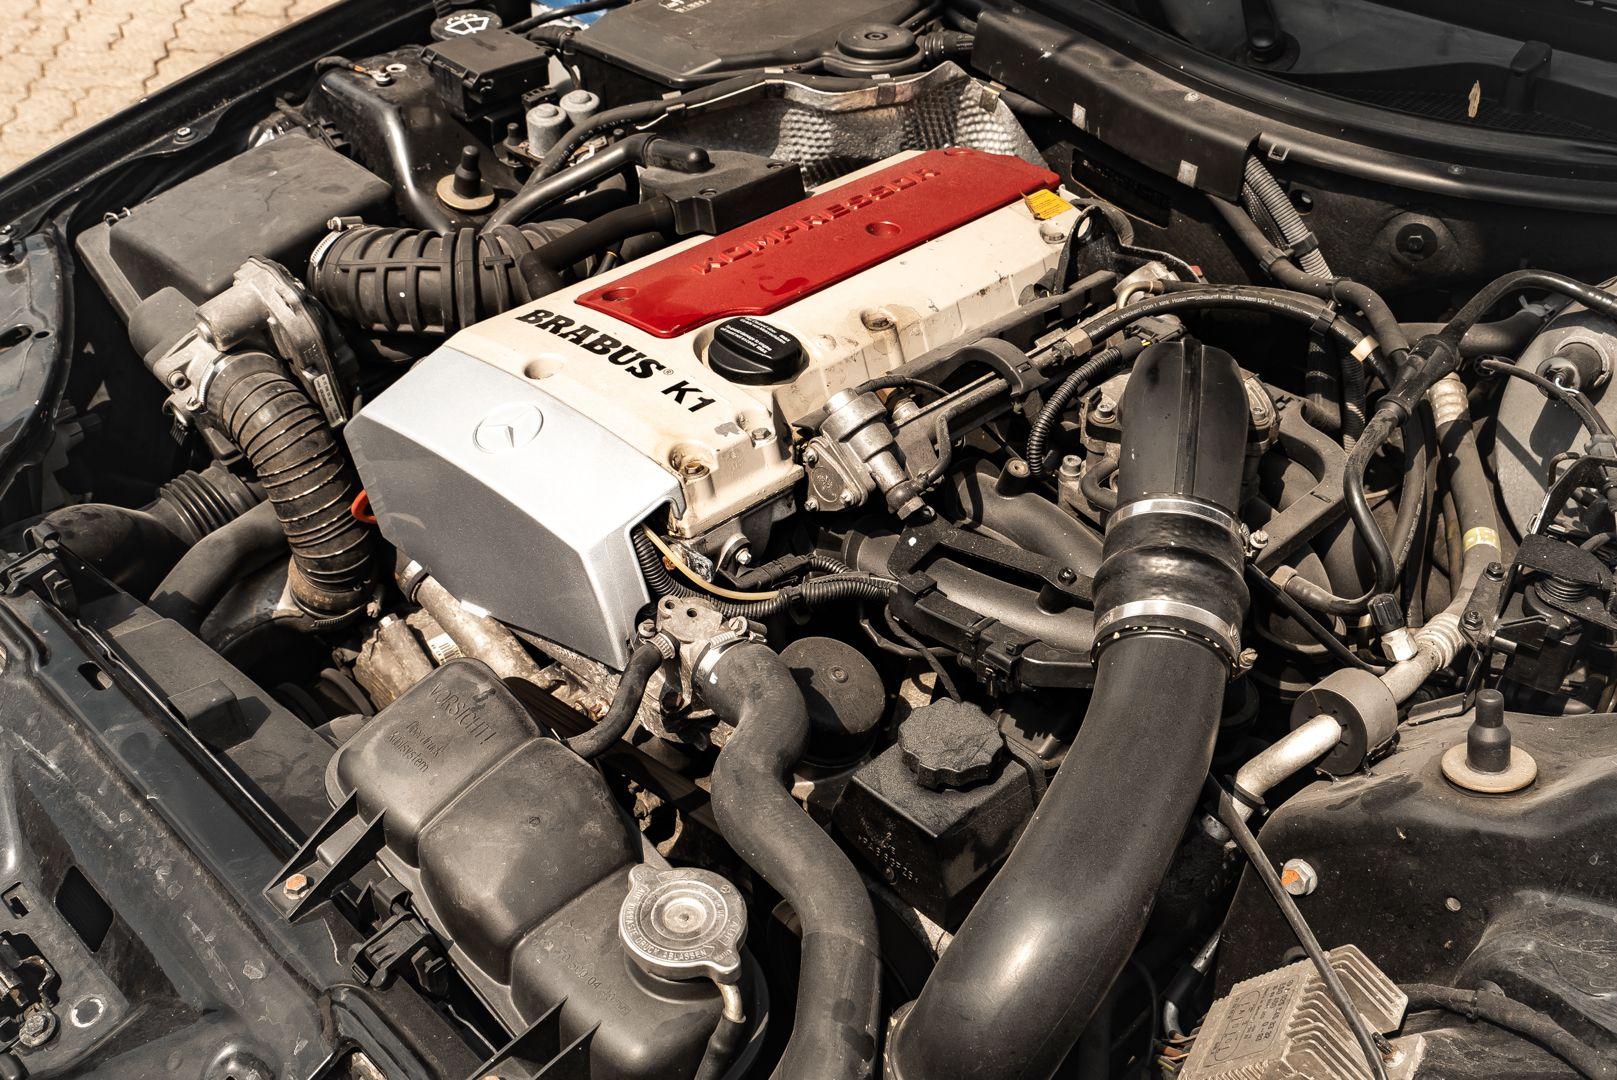 1998 Mercedes-Benz SLK 230 Brabus K1 73767